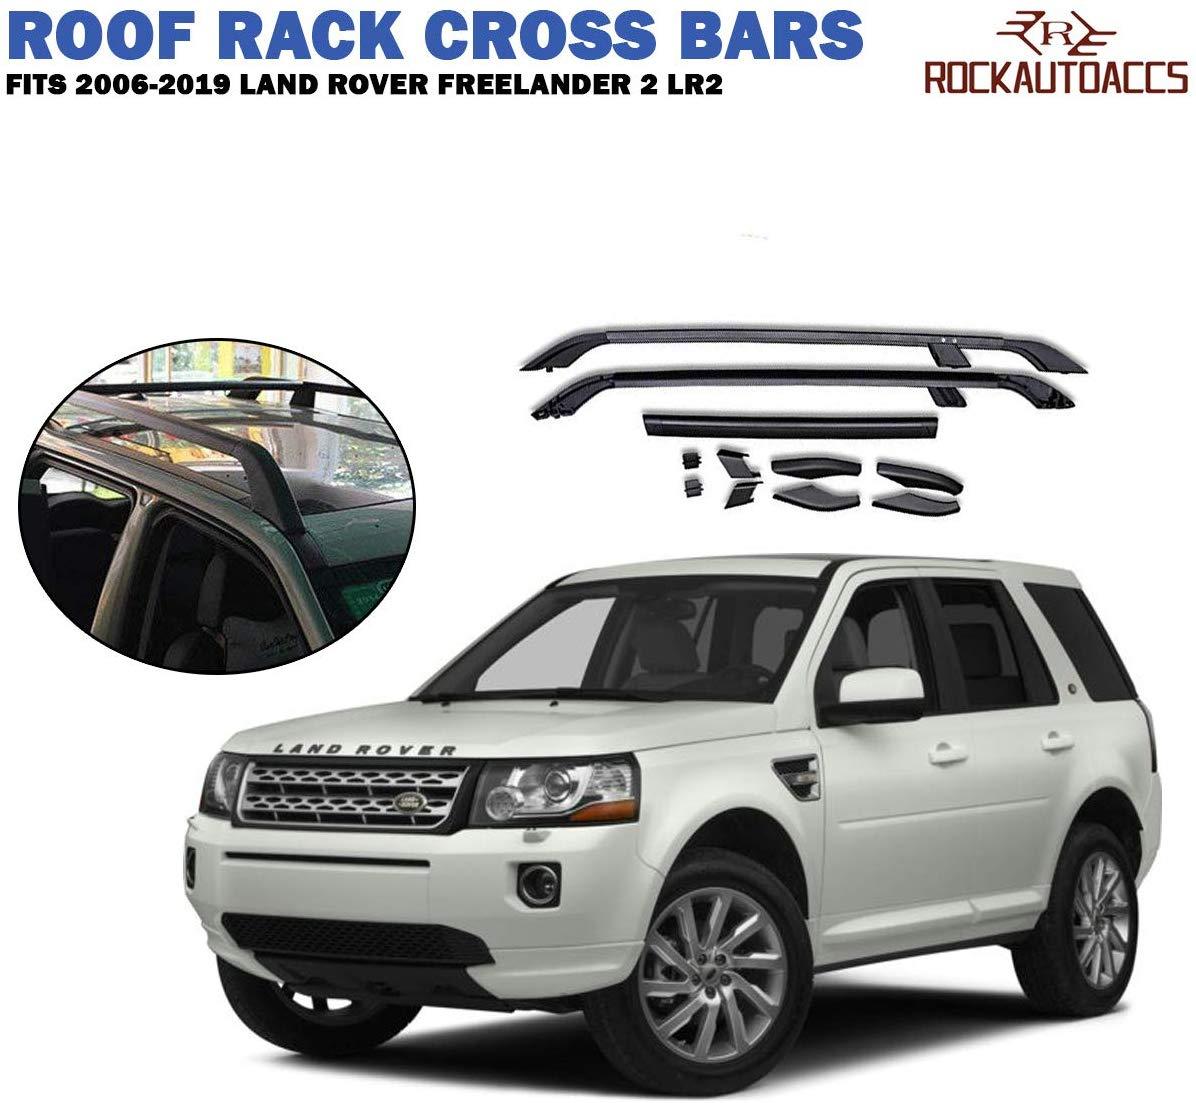 Black fit Land Rover Range Rover 2013 2014 2015 2016 2017 roof rack cross bar